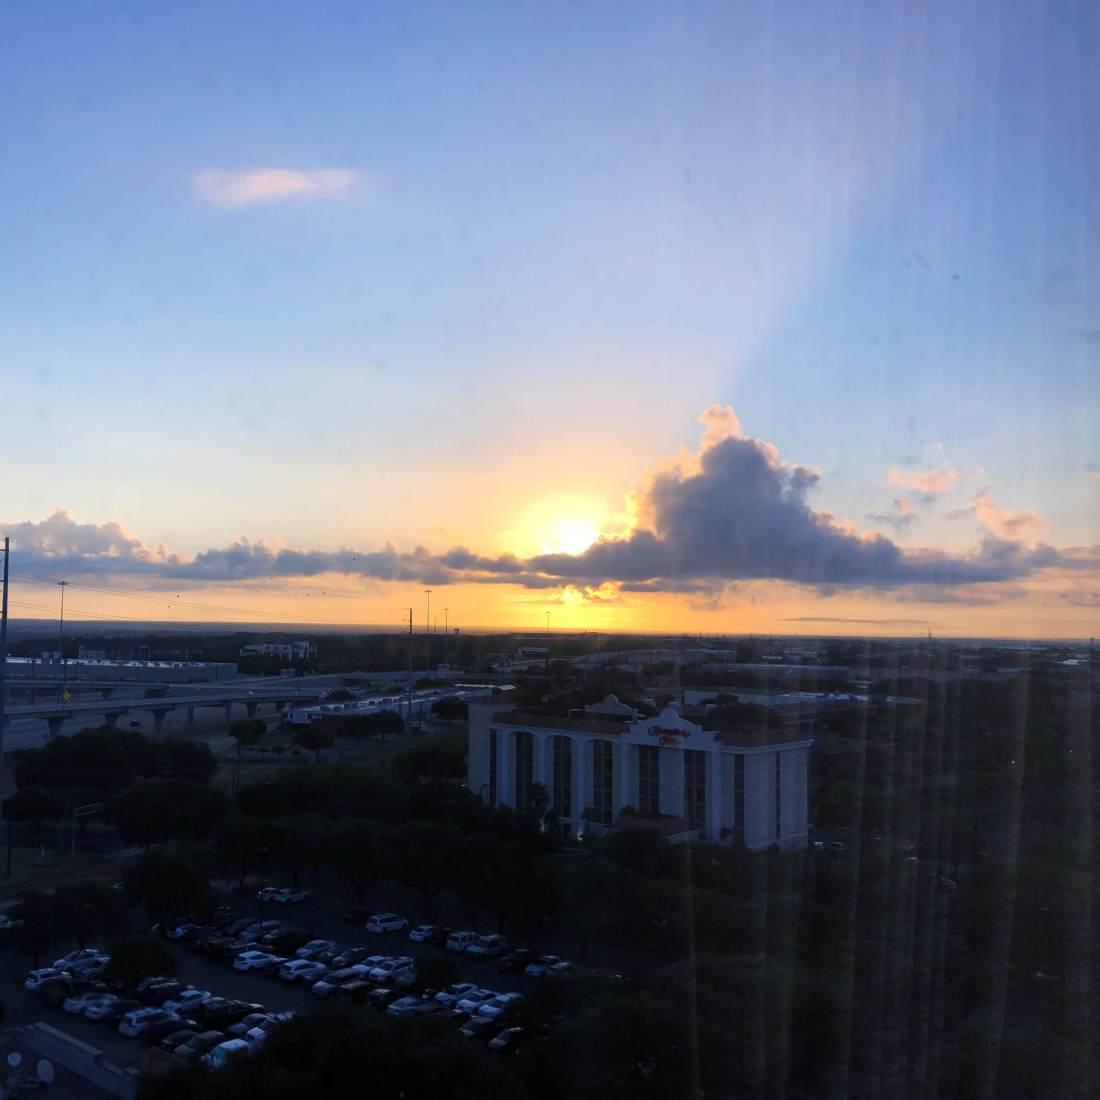 Sunrise from Hotel Omni Southpark in Austin, Texas